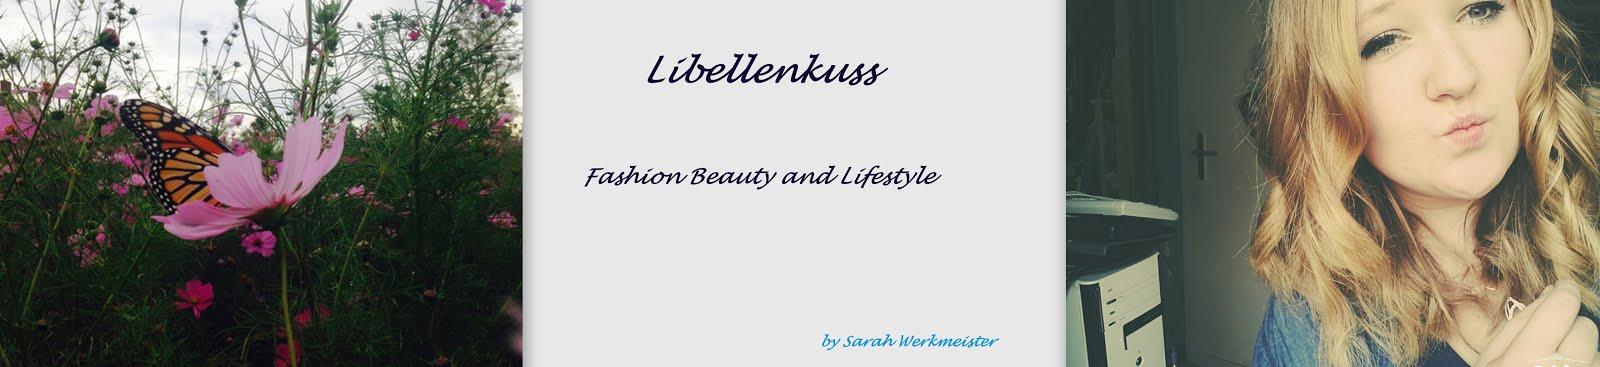 S.W Lifestyleblog